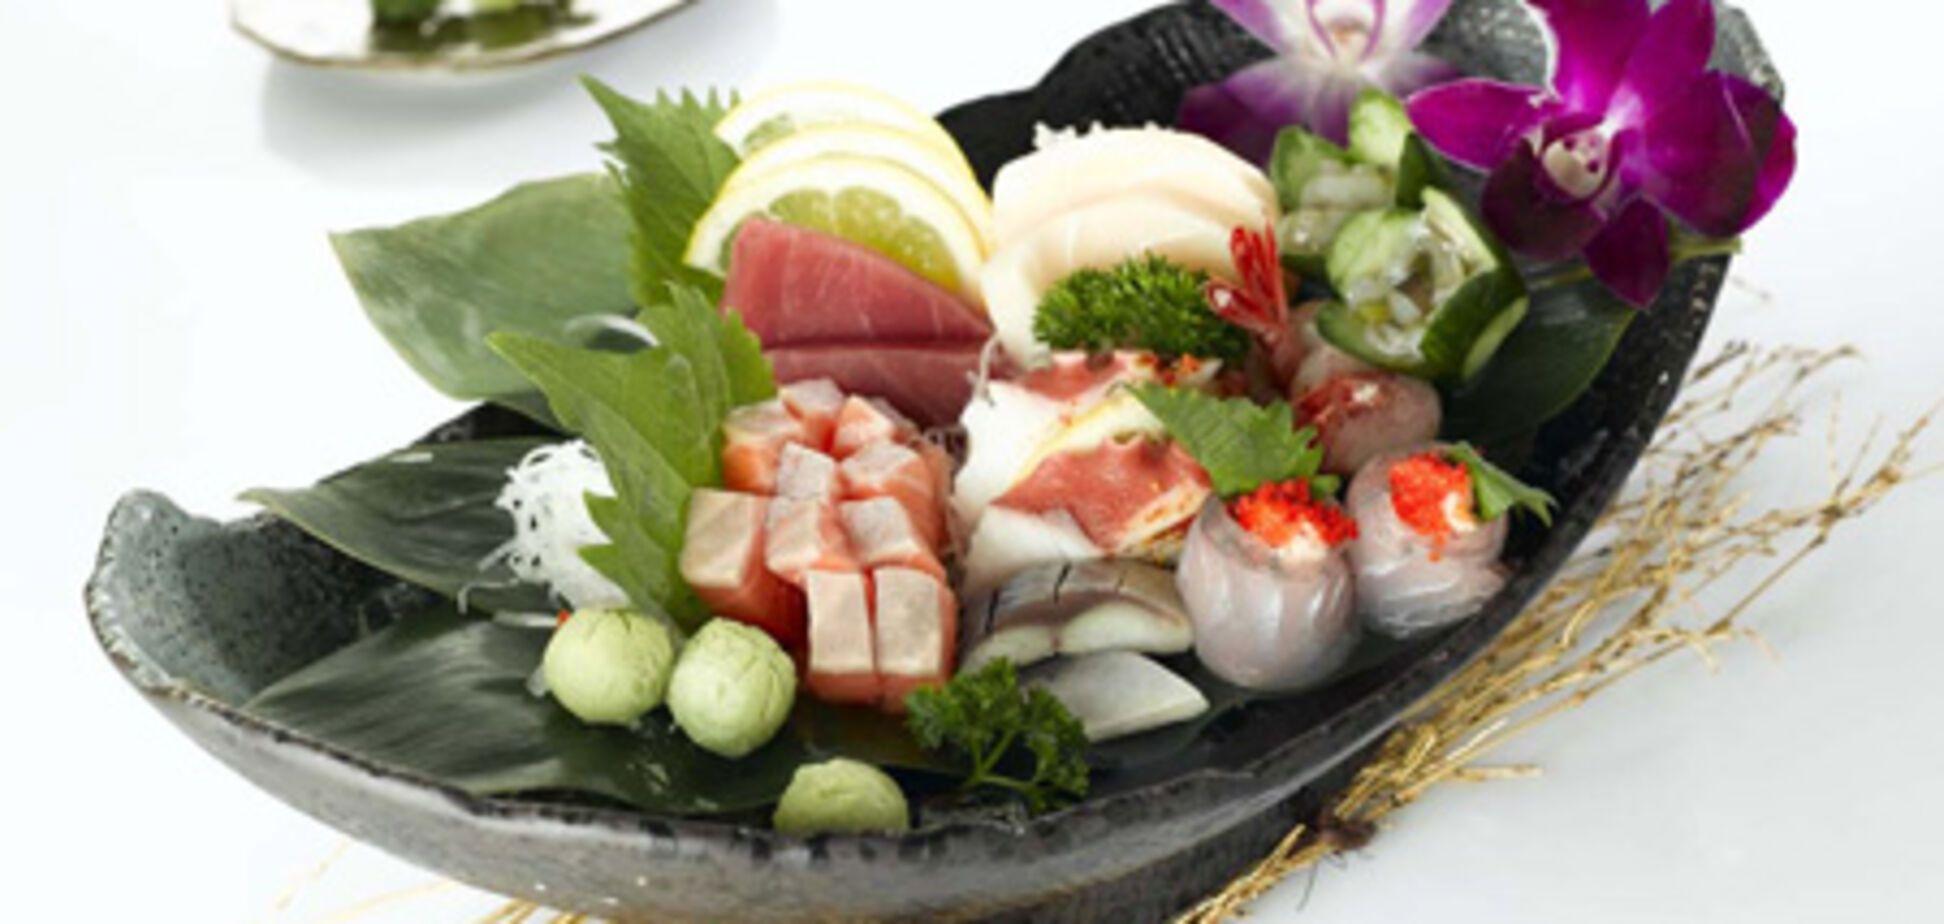 Токио - кулинарная столица мира